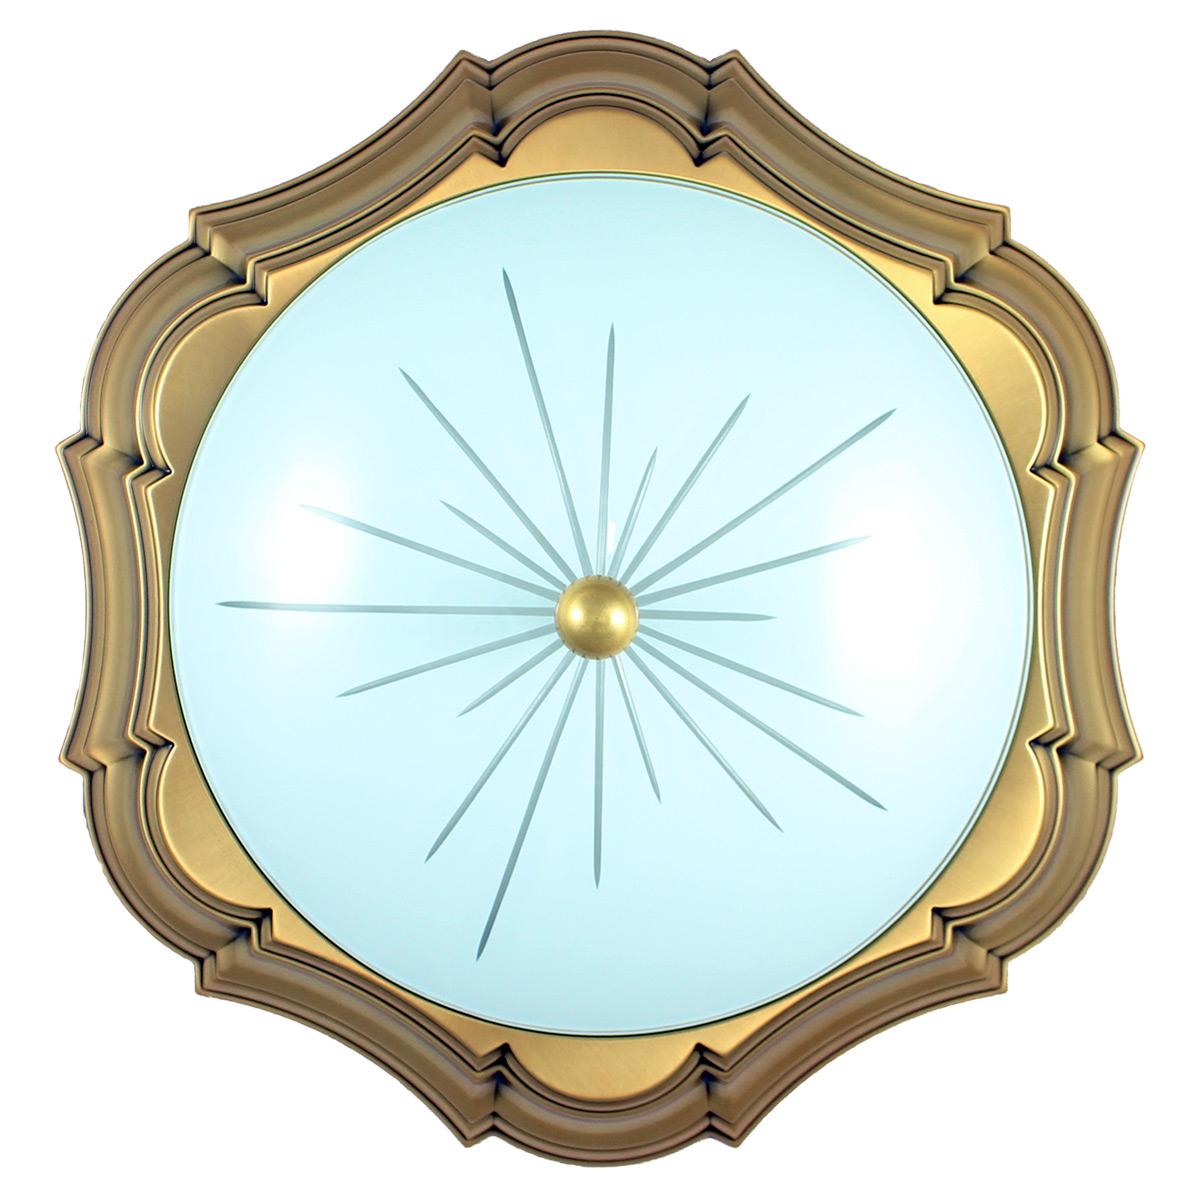 Imagen de Lámpara de techo de bronce - Estilo clásico - Diámetro 40,5 cm